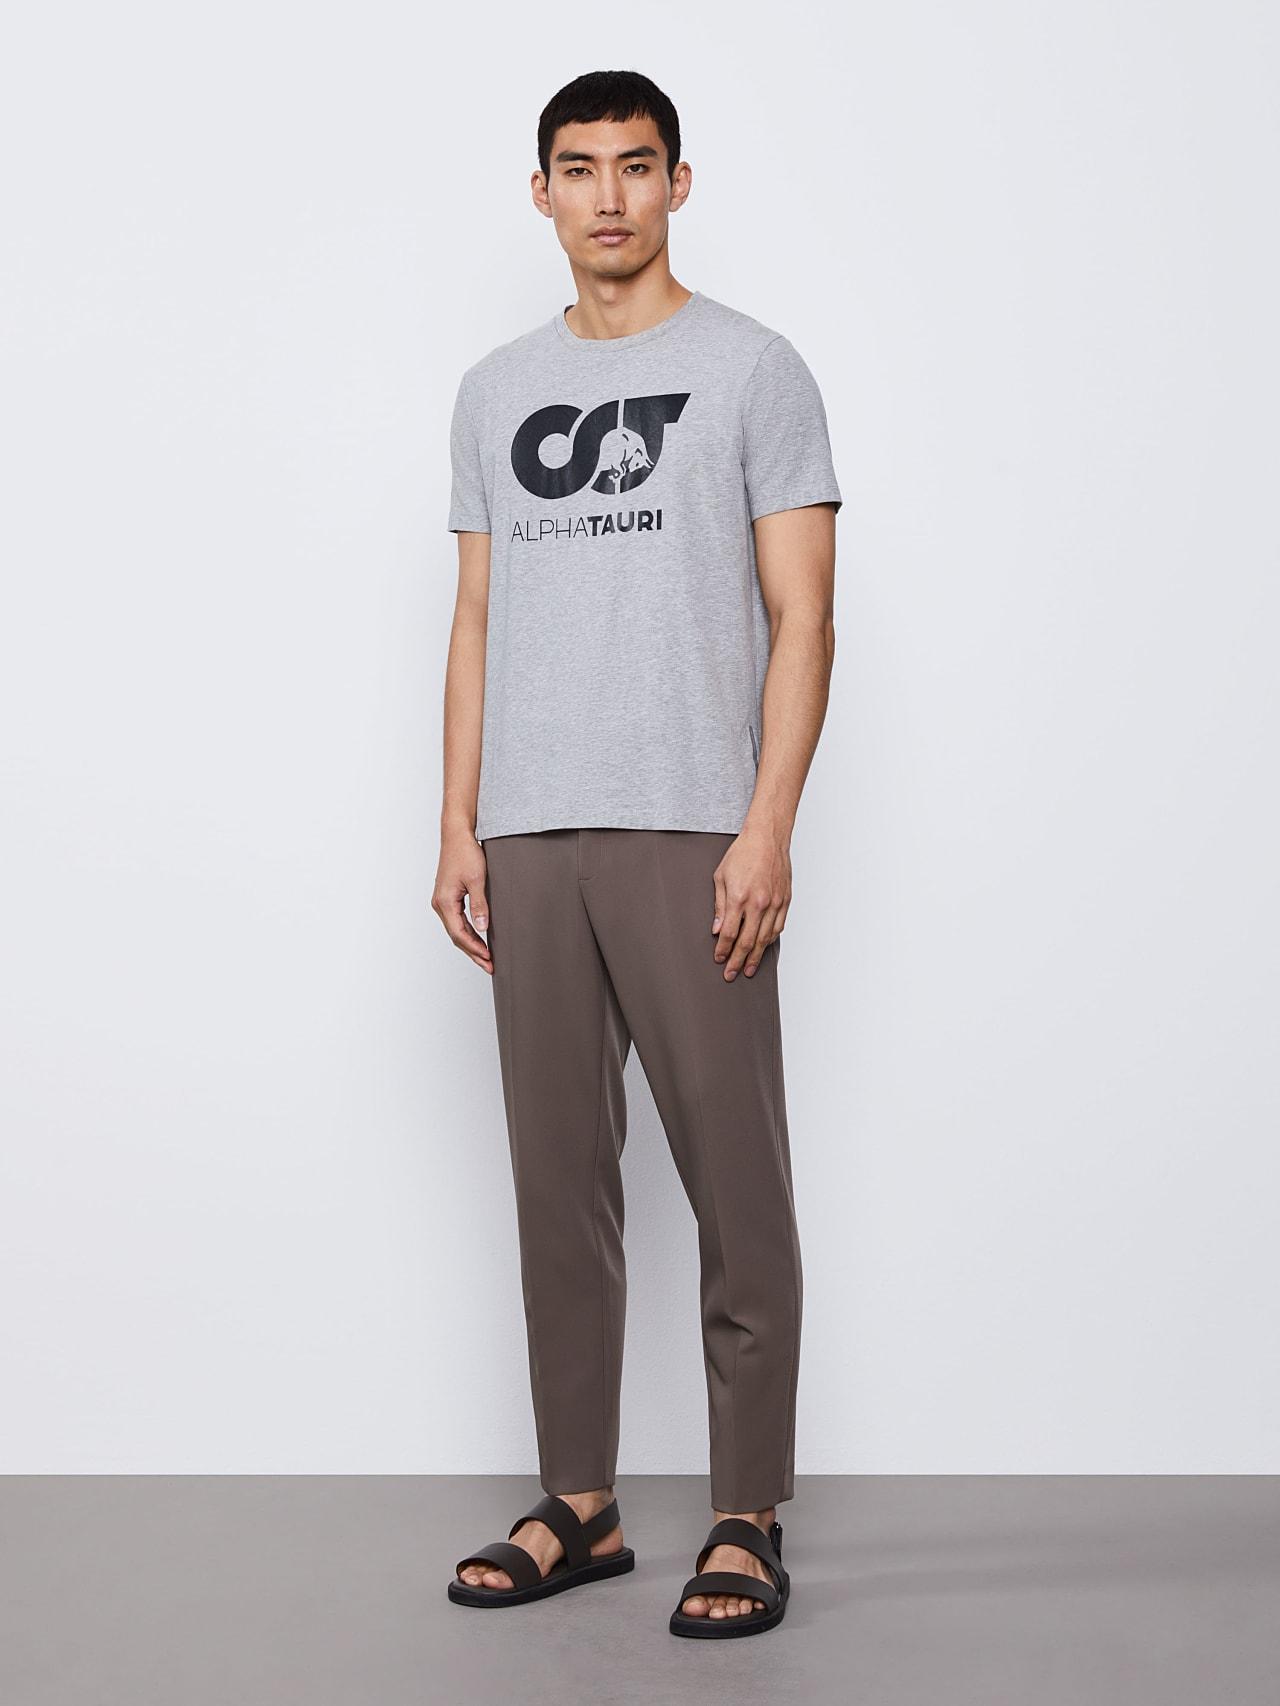 JERO V2.Y4.02 Signature Logo T-Shirt grey / melange Front Alpha Tauri